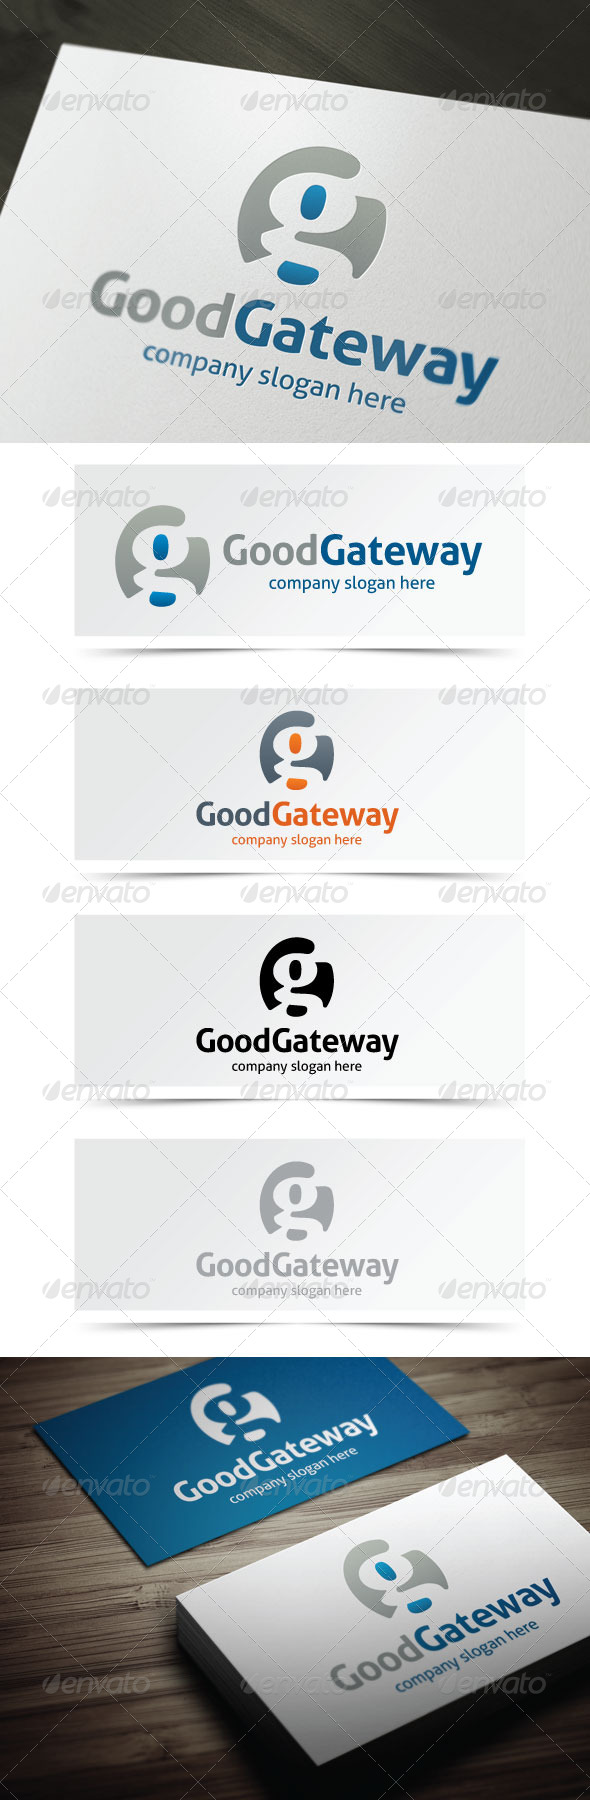 GraphicRiver Good Gateway 5275450